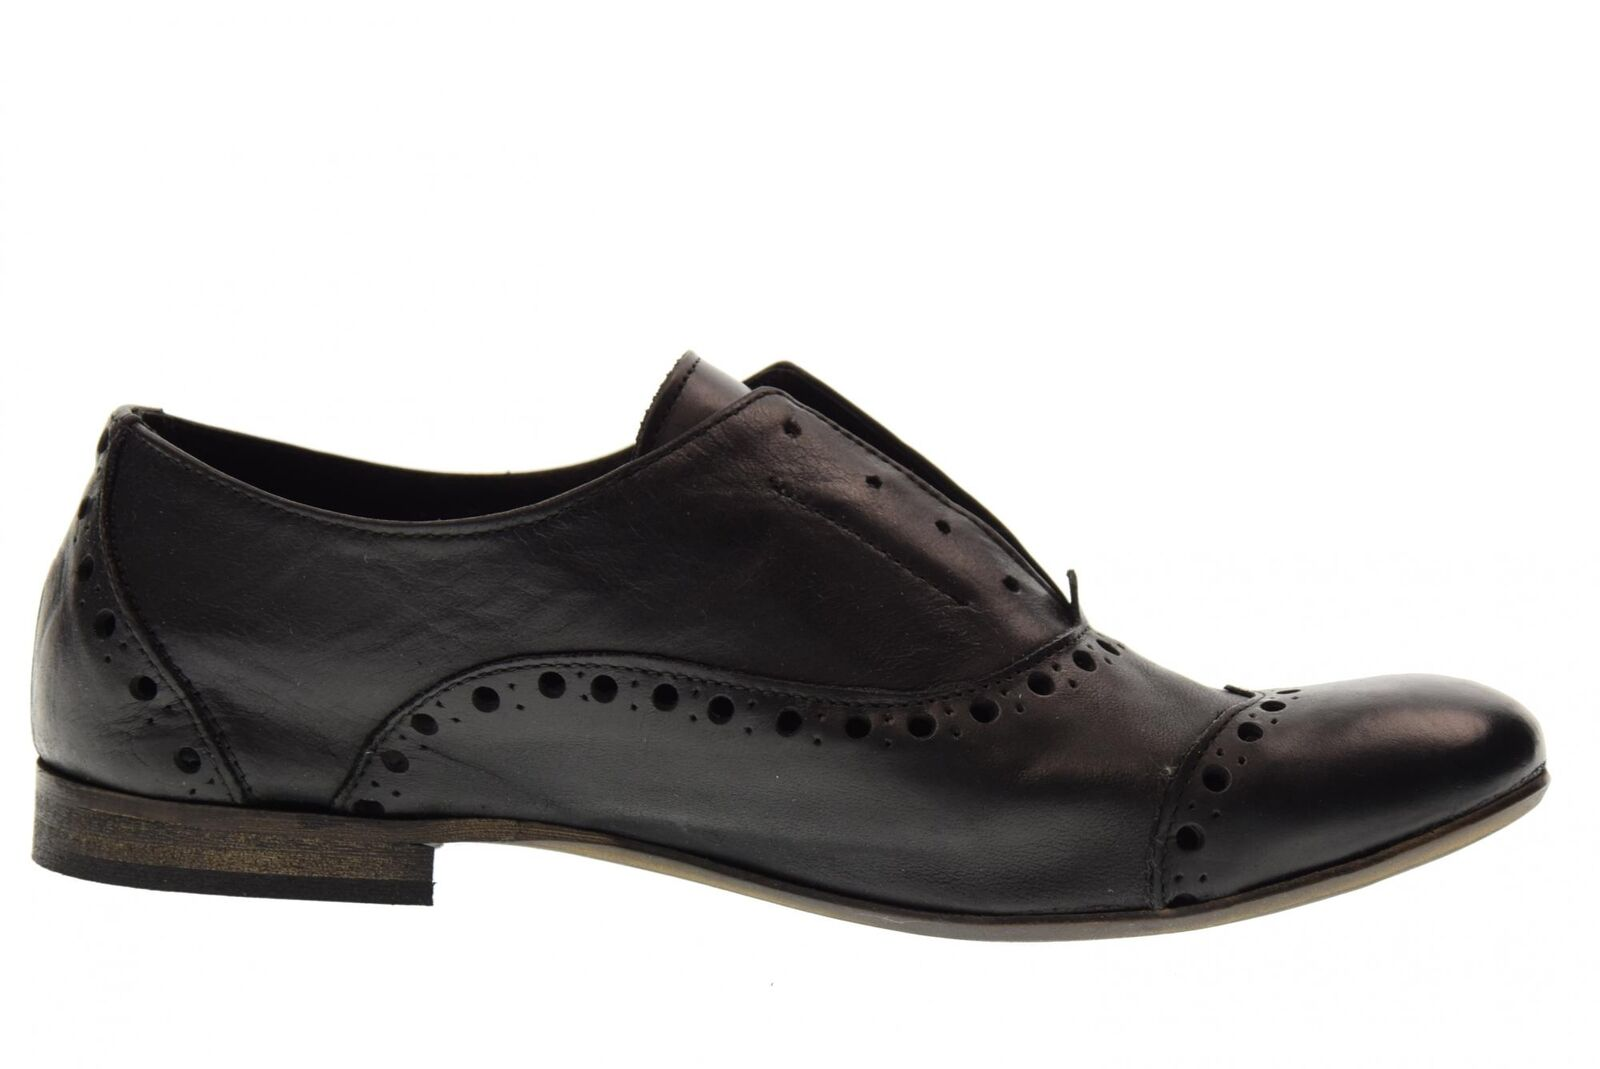 Erman's P18f chaussures classiques classiques chaussures 210FOR BLACK 98e6b6